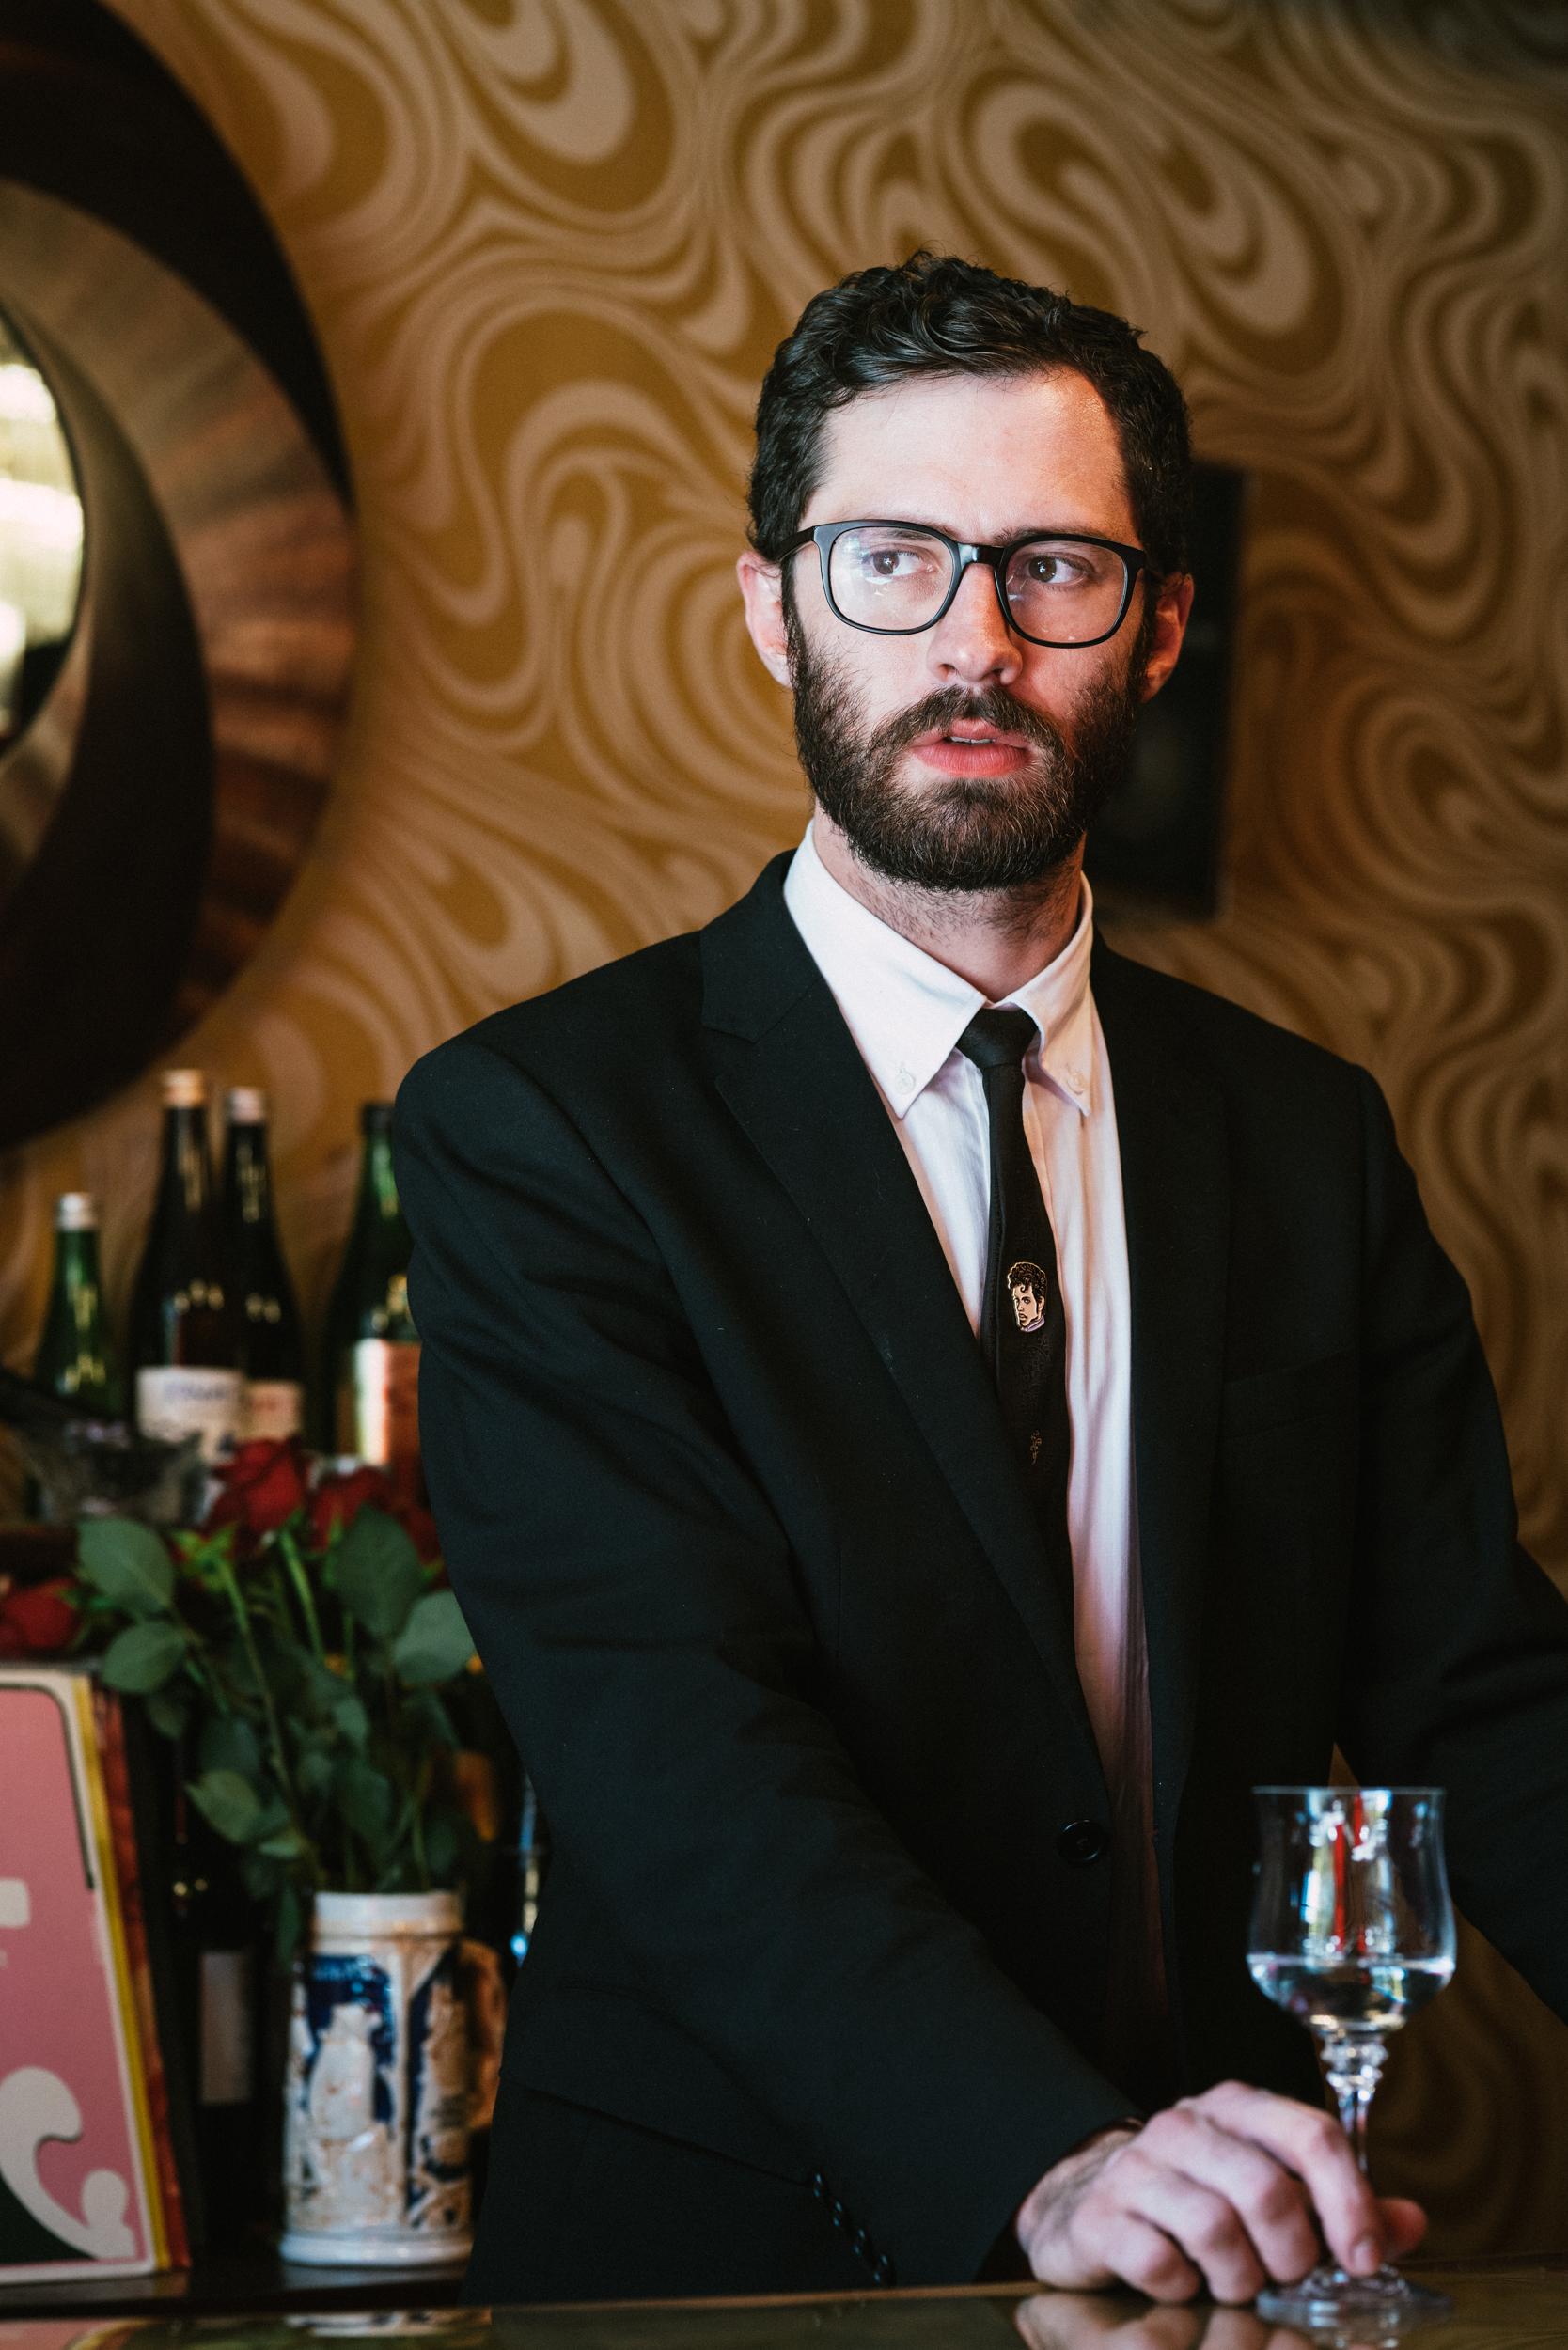 Matthew  Owner of Chandelier Sake Bar